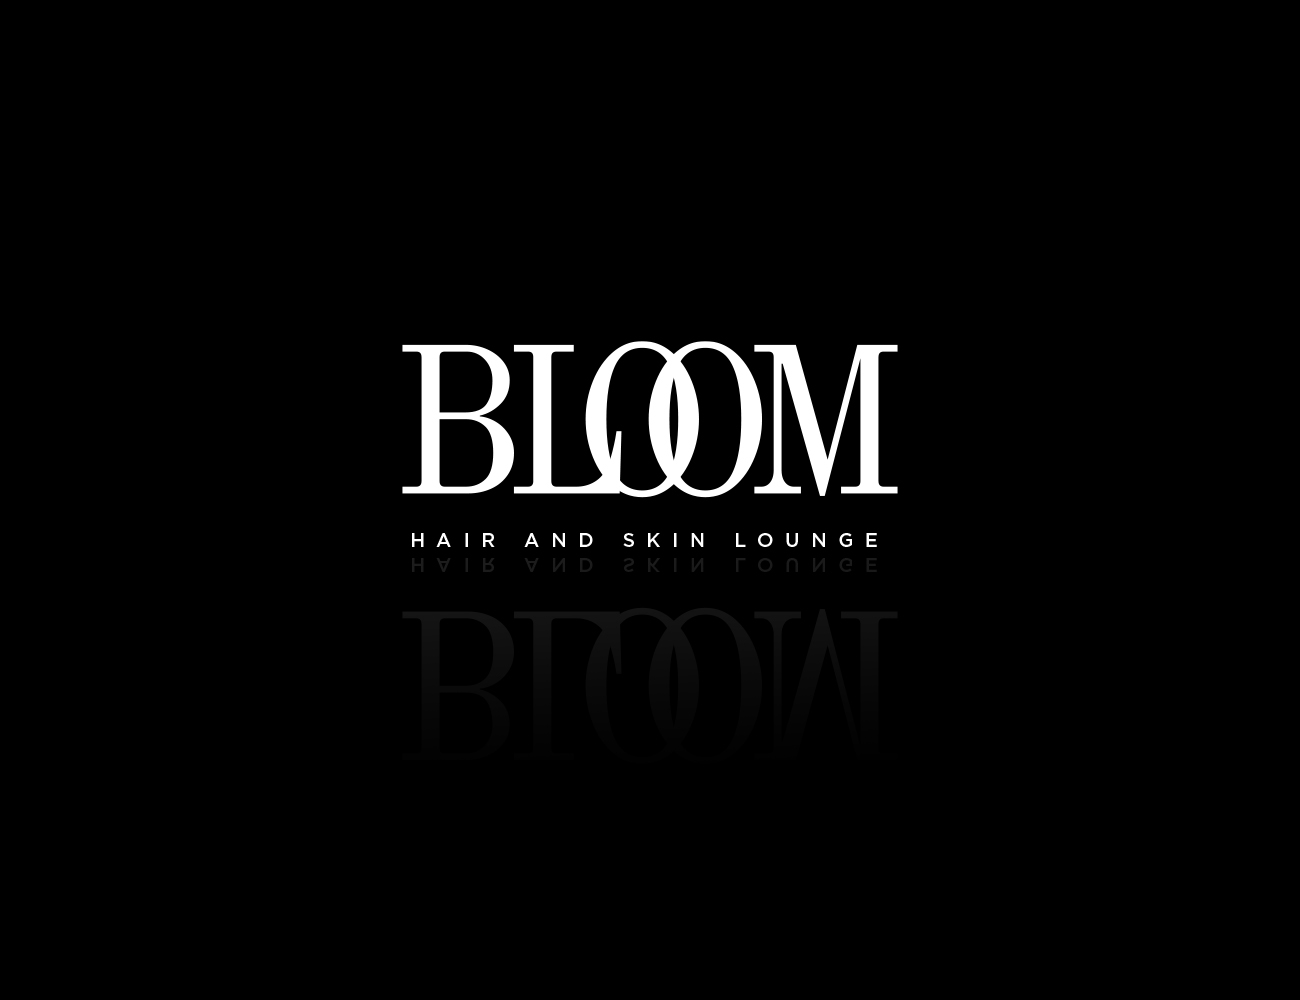 bloomlogodesign1